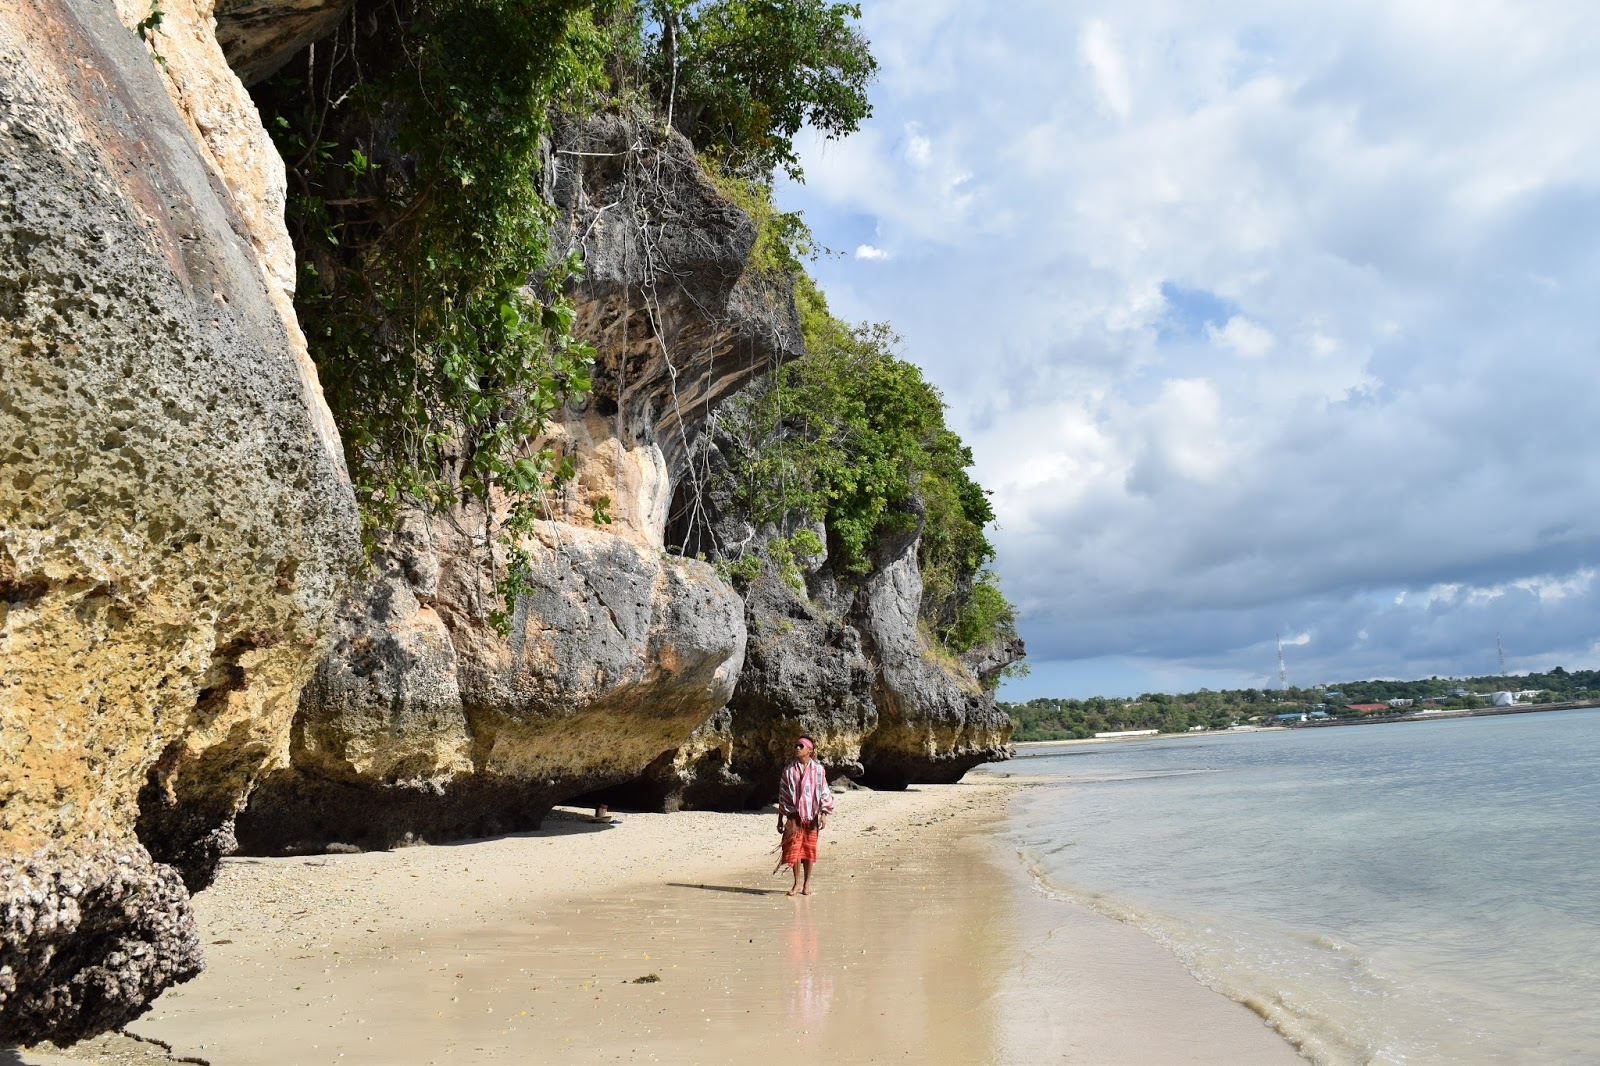 Limakaki Destinasi Wisata Alam Kupang Keindahan Wajib Eksplore Pantai Batu